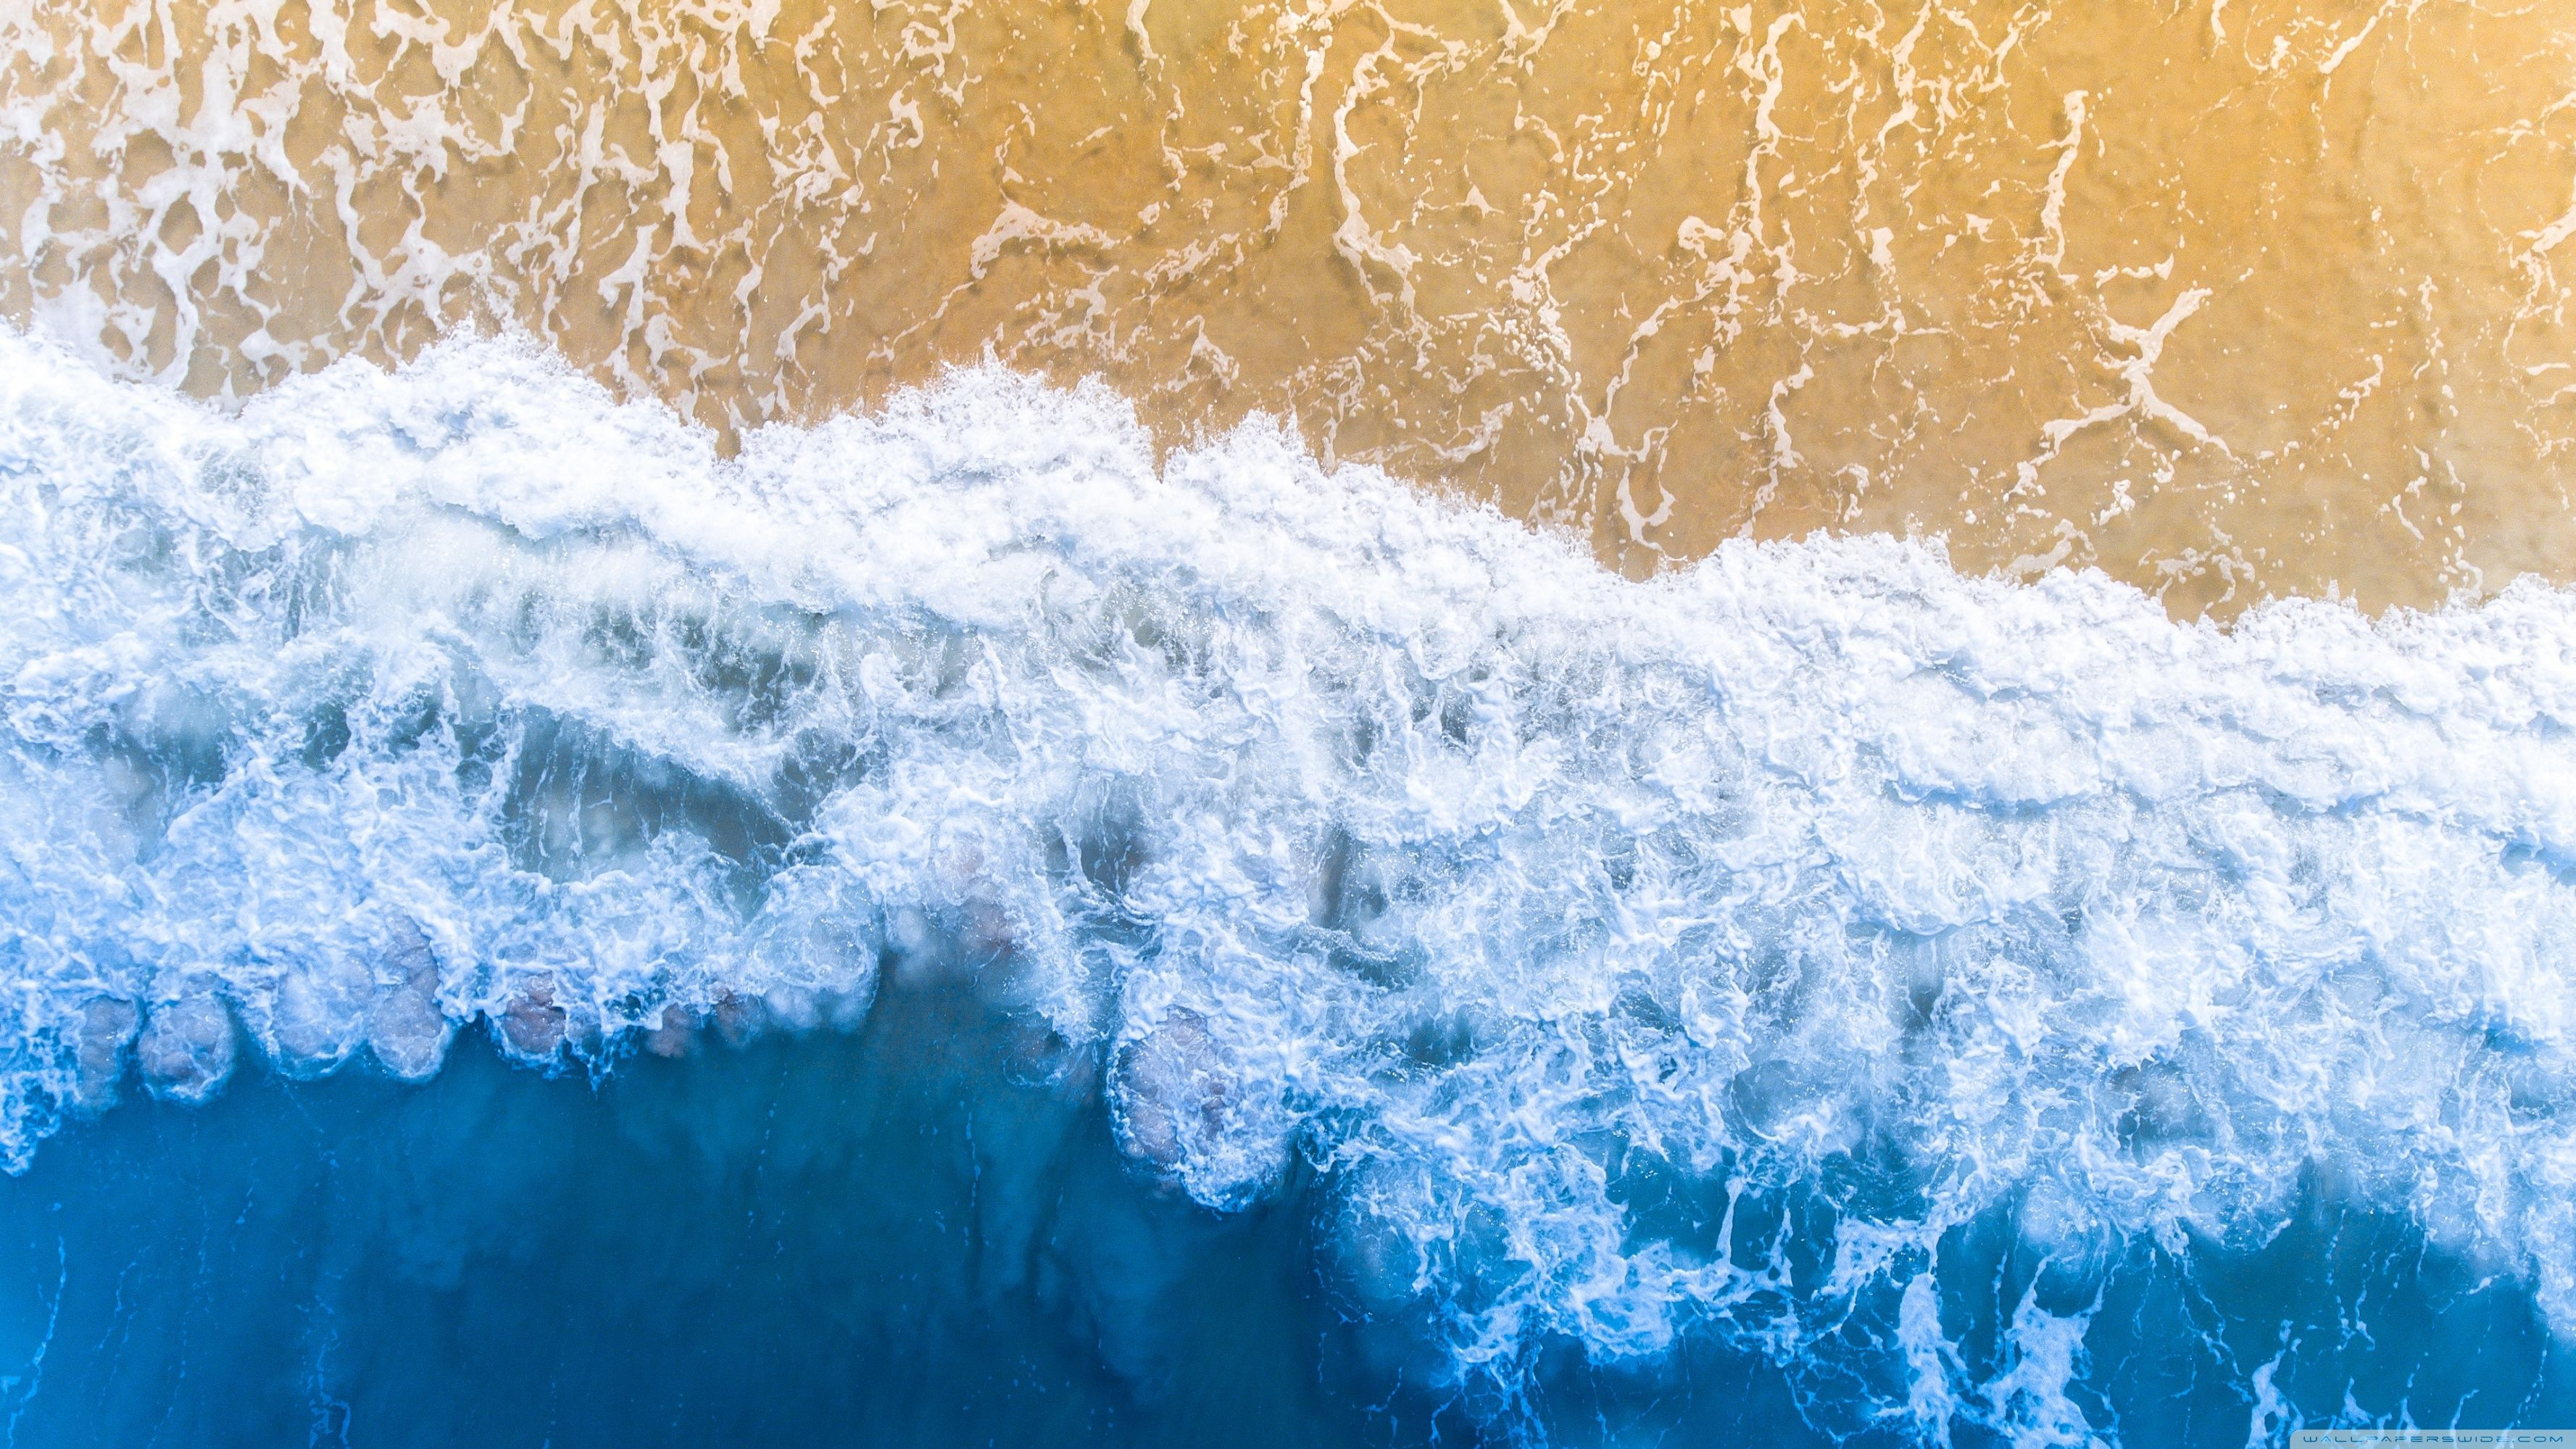 Beach Aesthetic Desktop Wallpapers Top Free Beach Aesthetic Desktop Backgrounds Wallpaperaccess